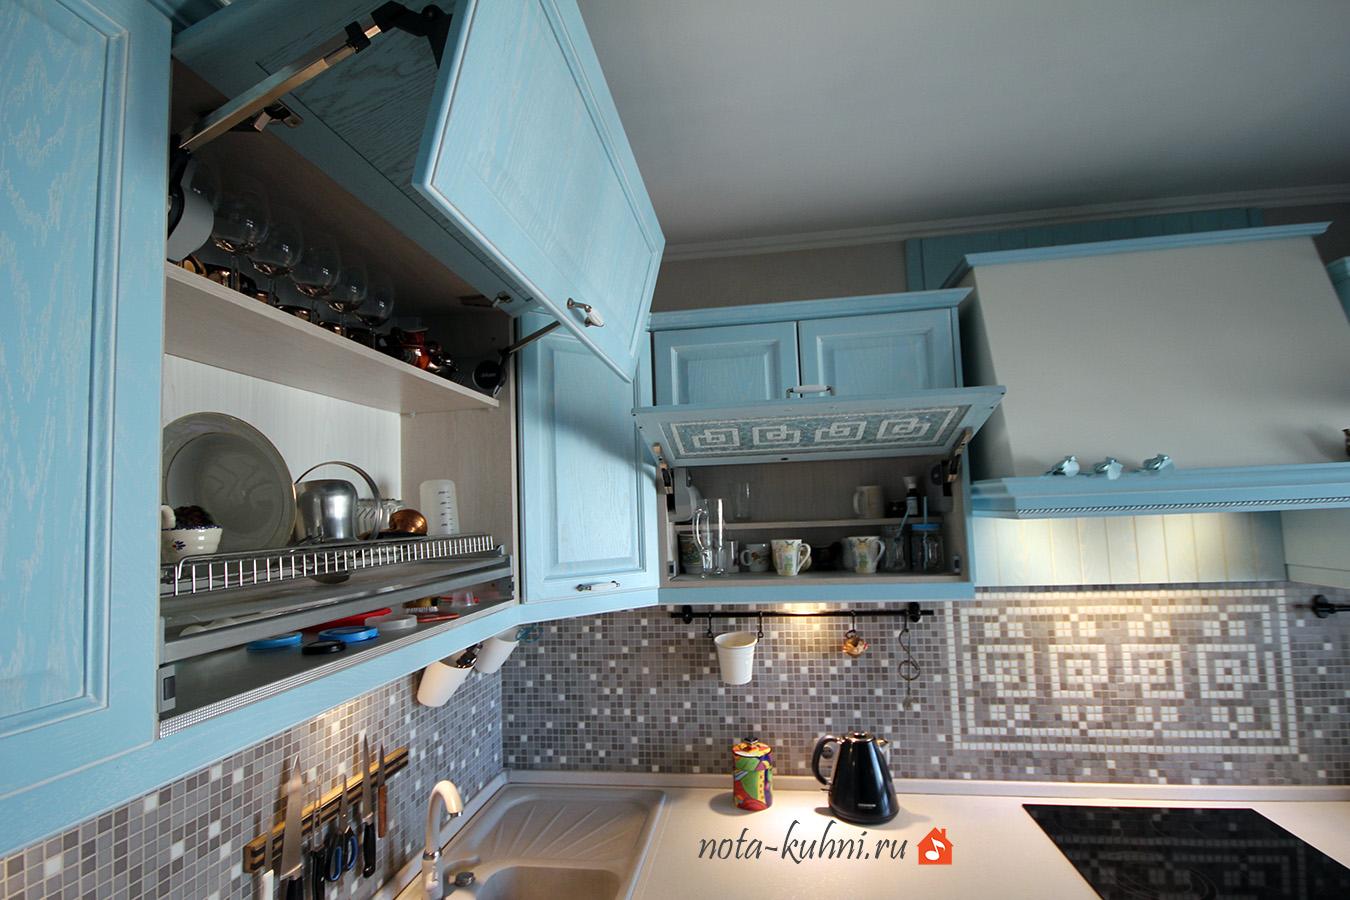 кухни на заказ с aventos HF blum